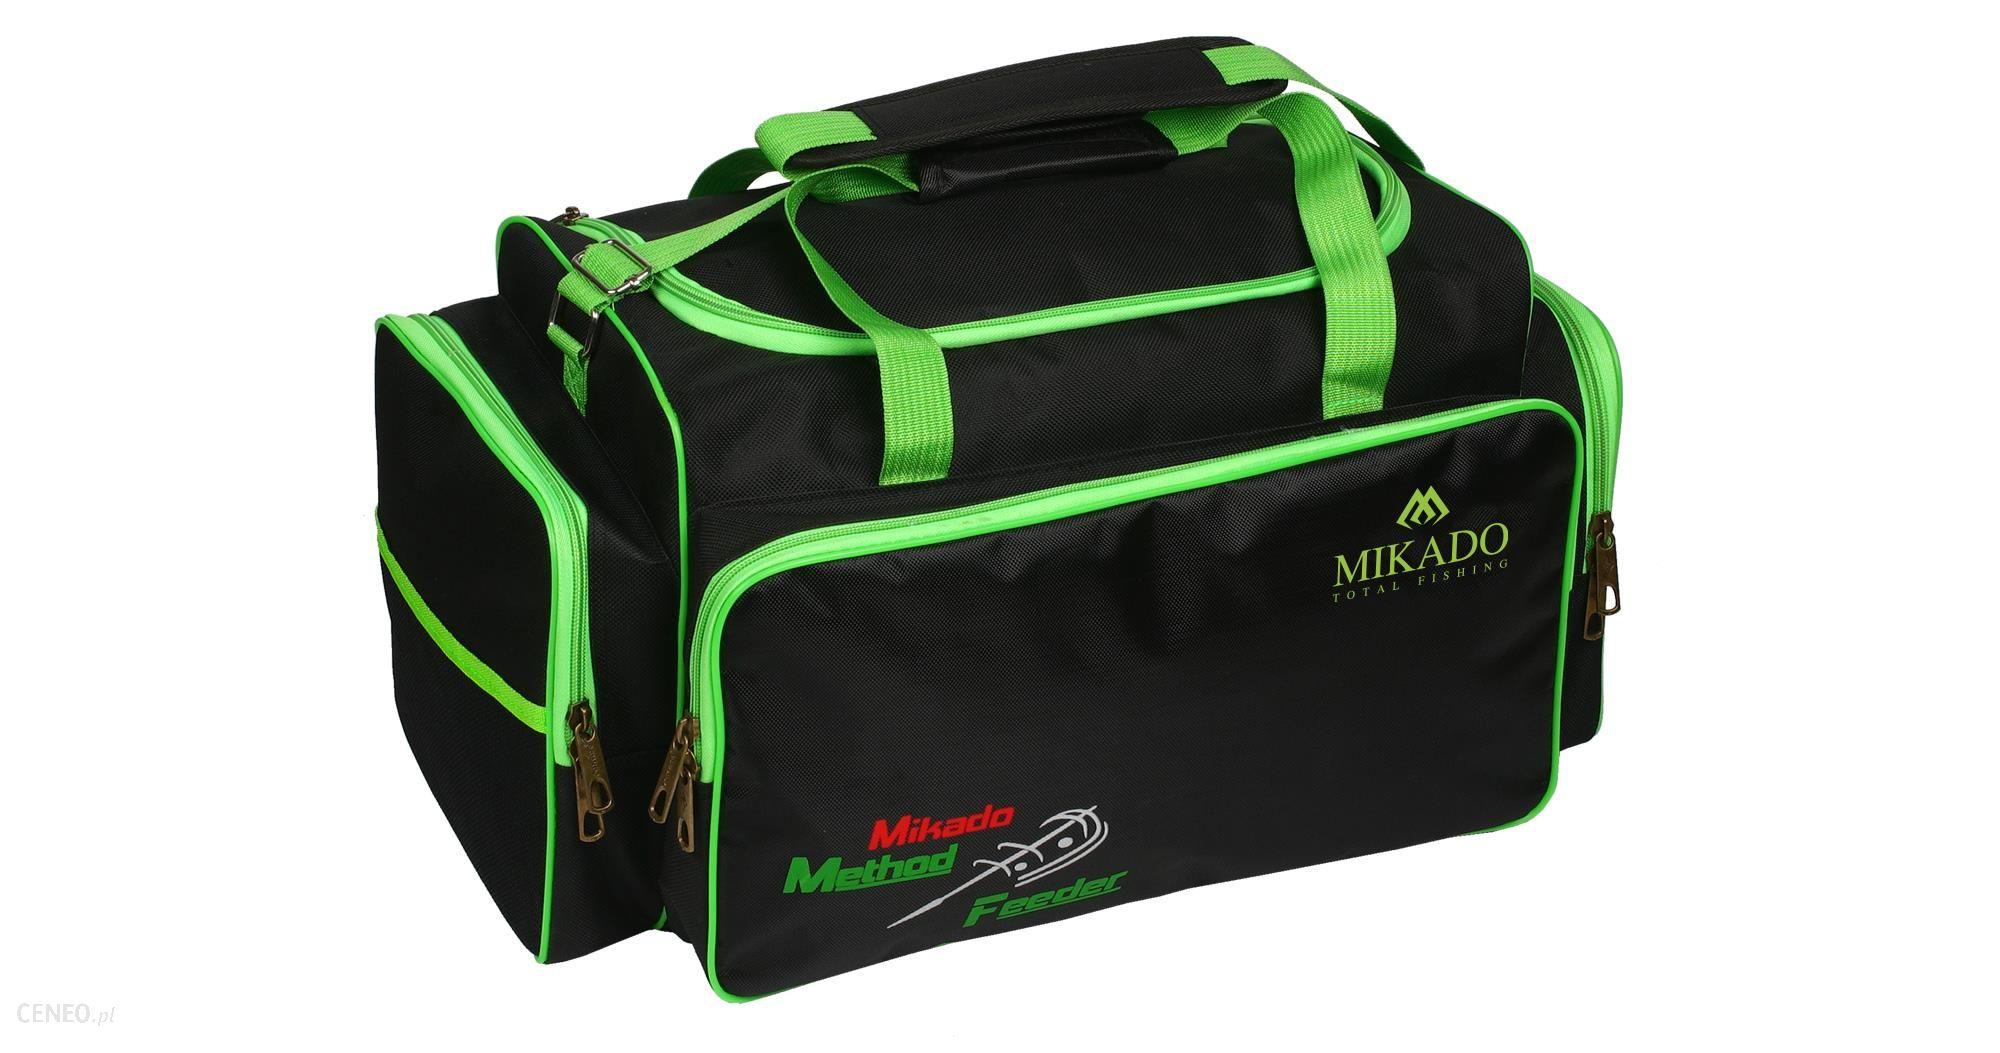 Mikado Torba Method Feeder 53X30X26Cm